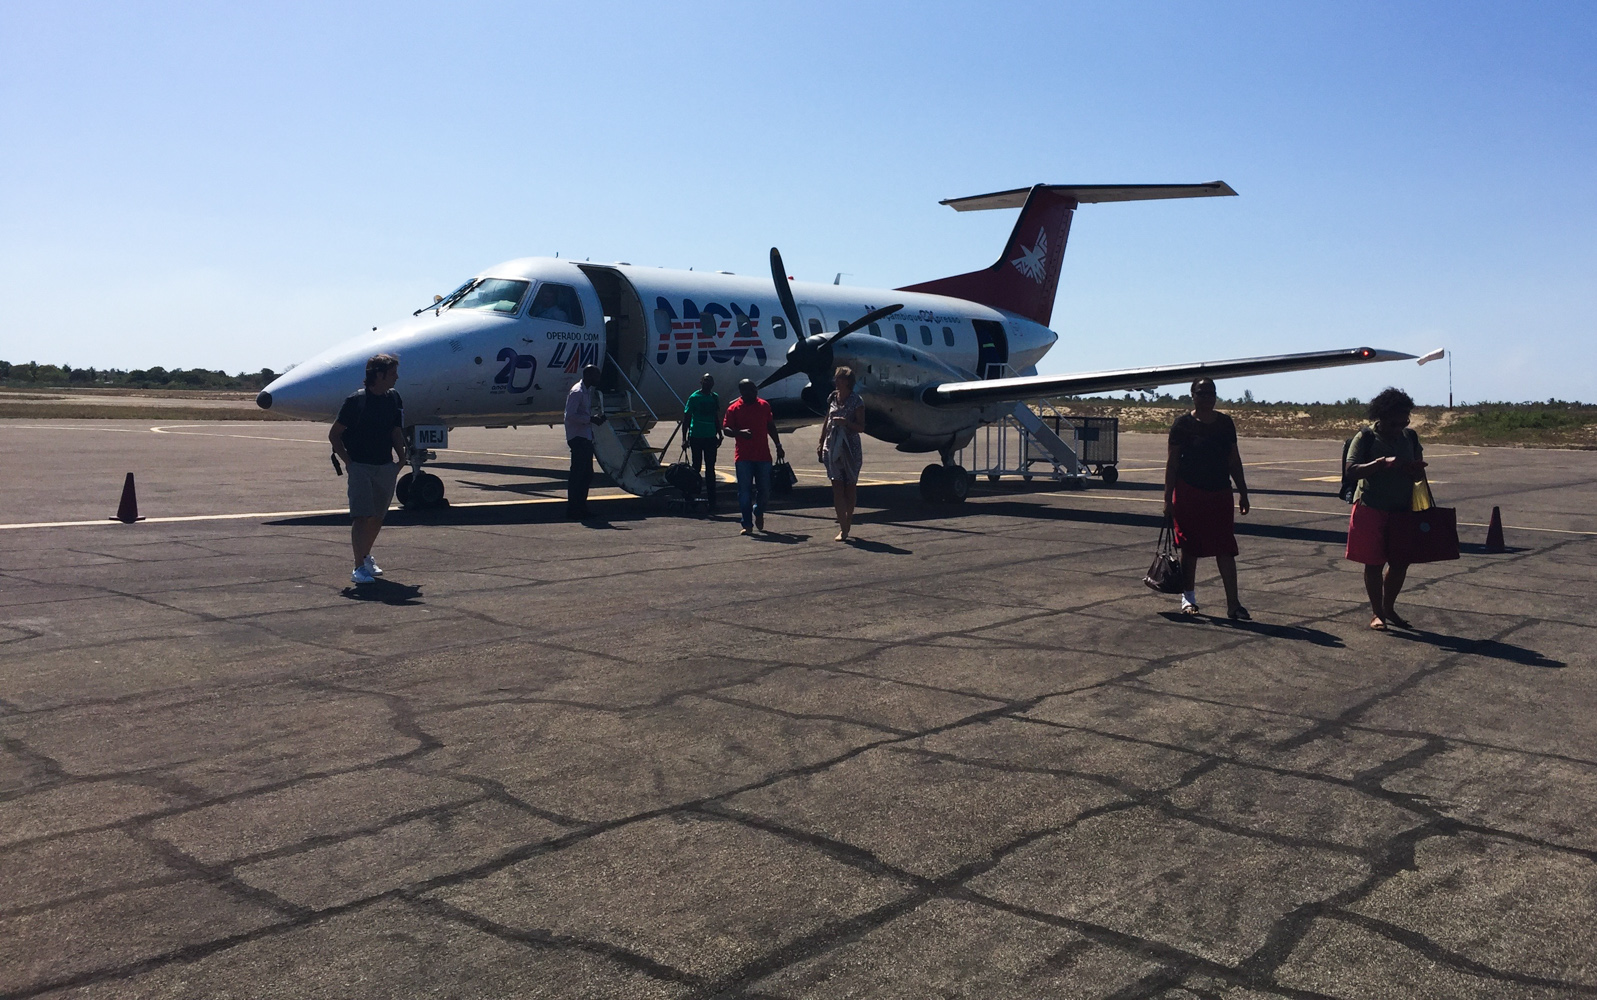 Mozambique_Tofo_Tofo_Peri_Flug-2